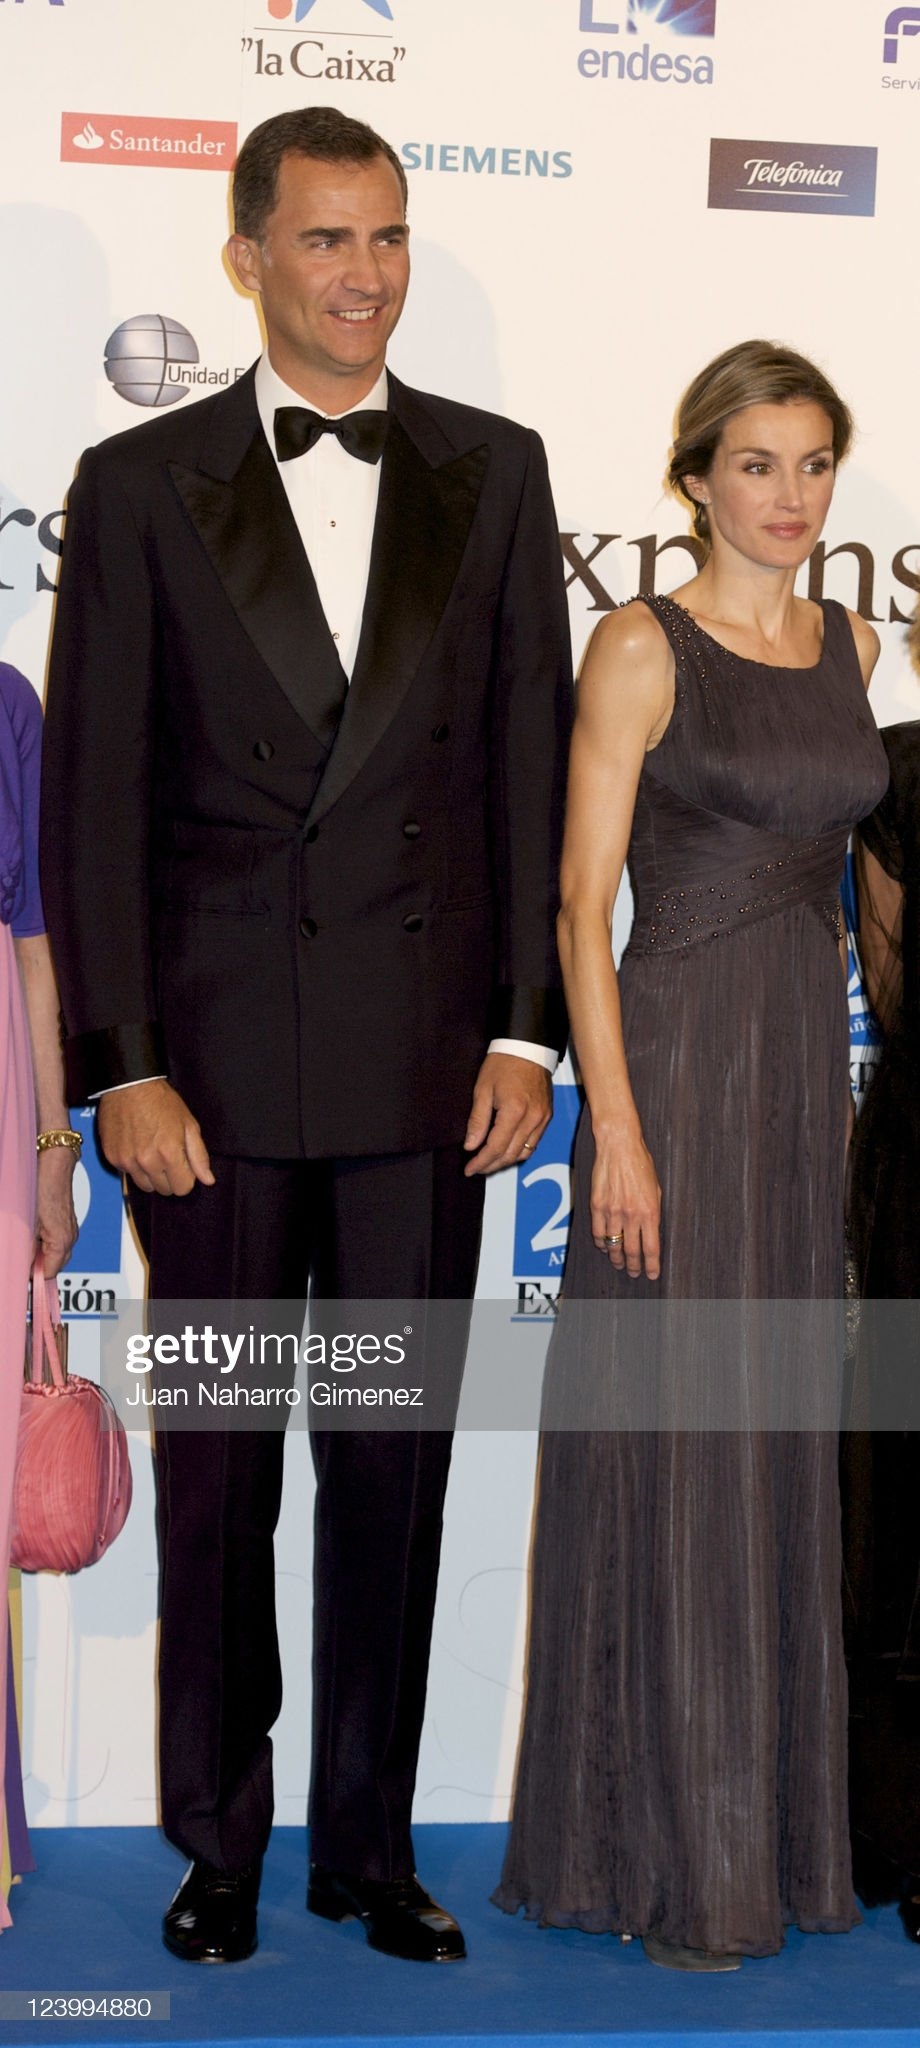 Prince Felipe and Princess Letizia Attend the XXV Anniversary of 'Expansion' Newspaper : News Photo